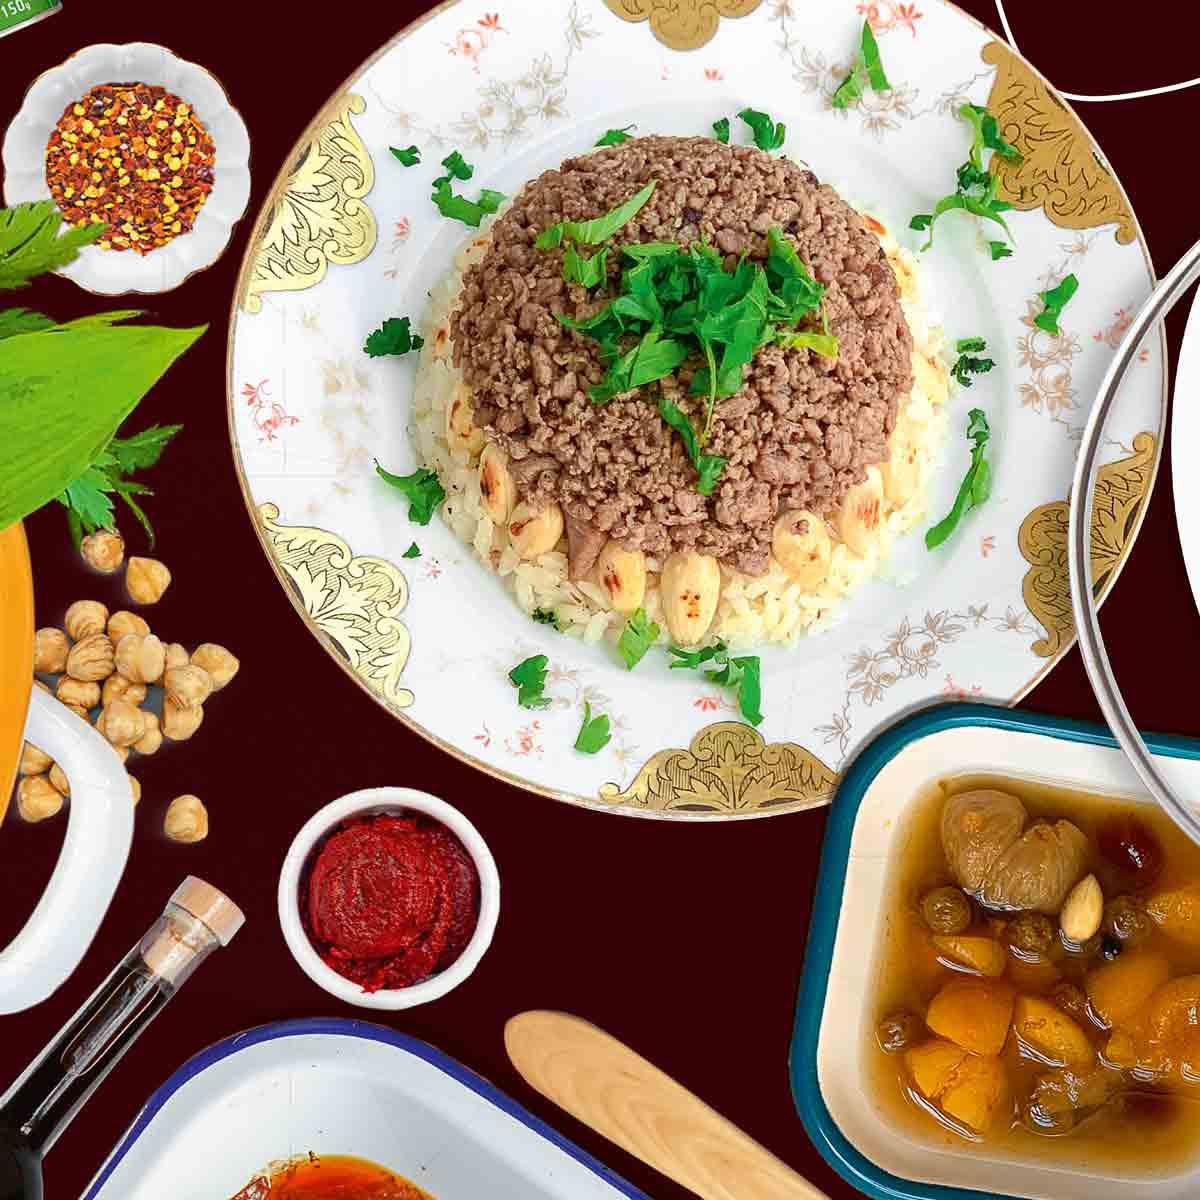 Ramazan2021 instagramfeed grid 30x 05 2021 05 06